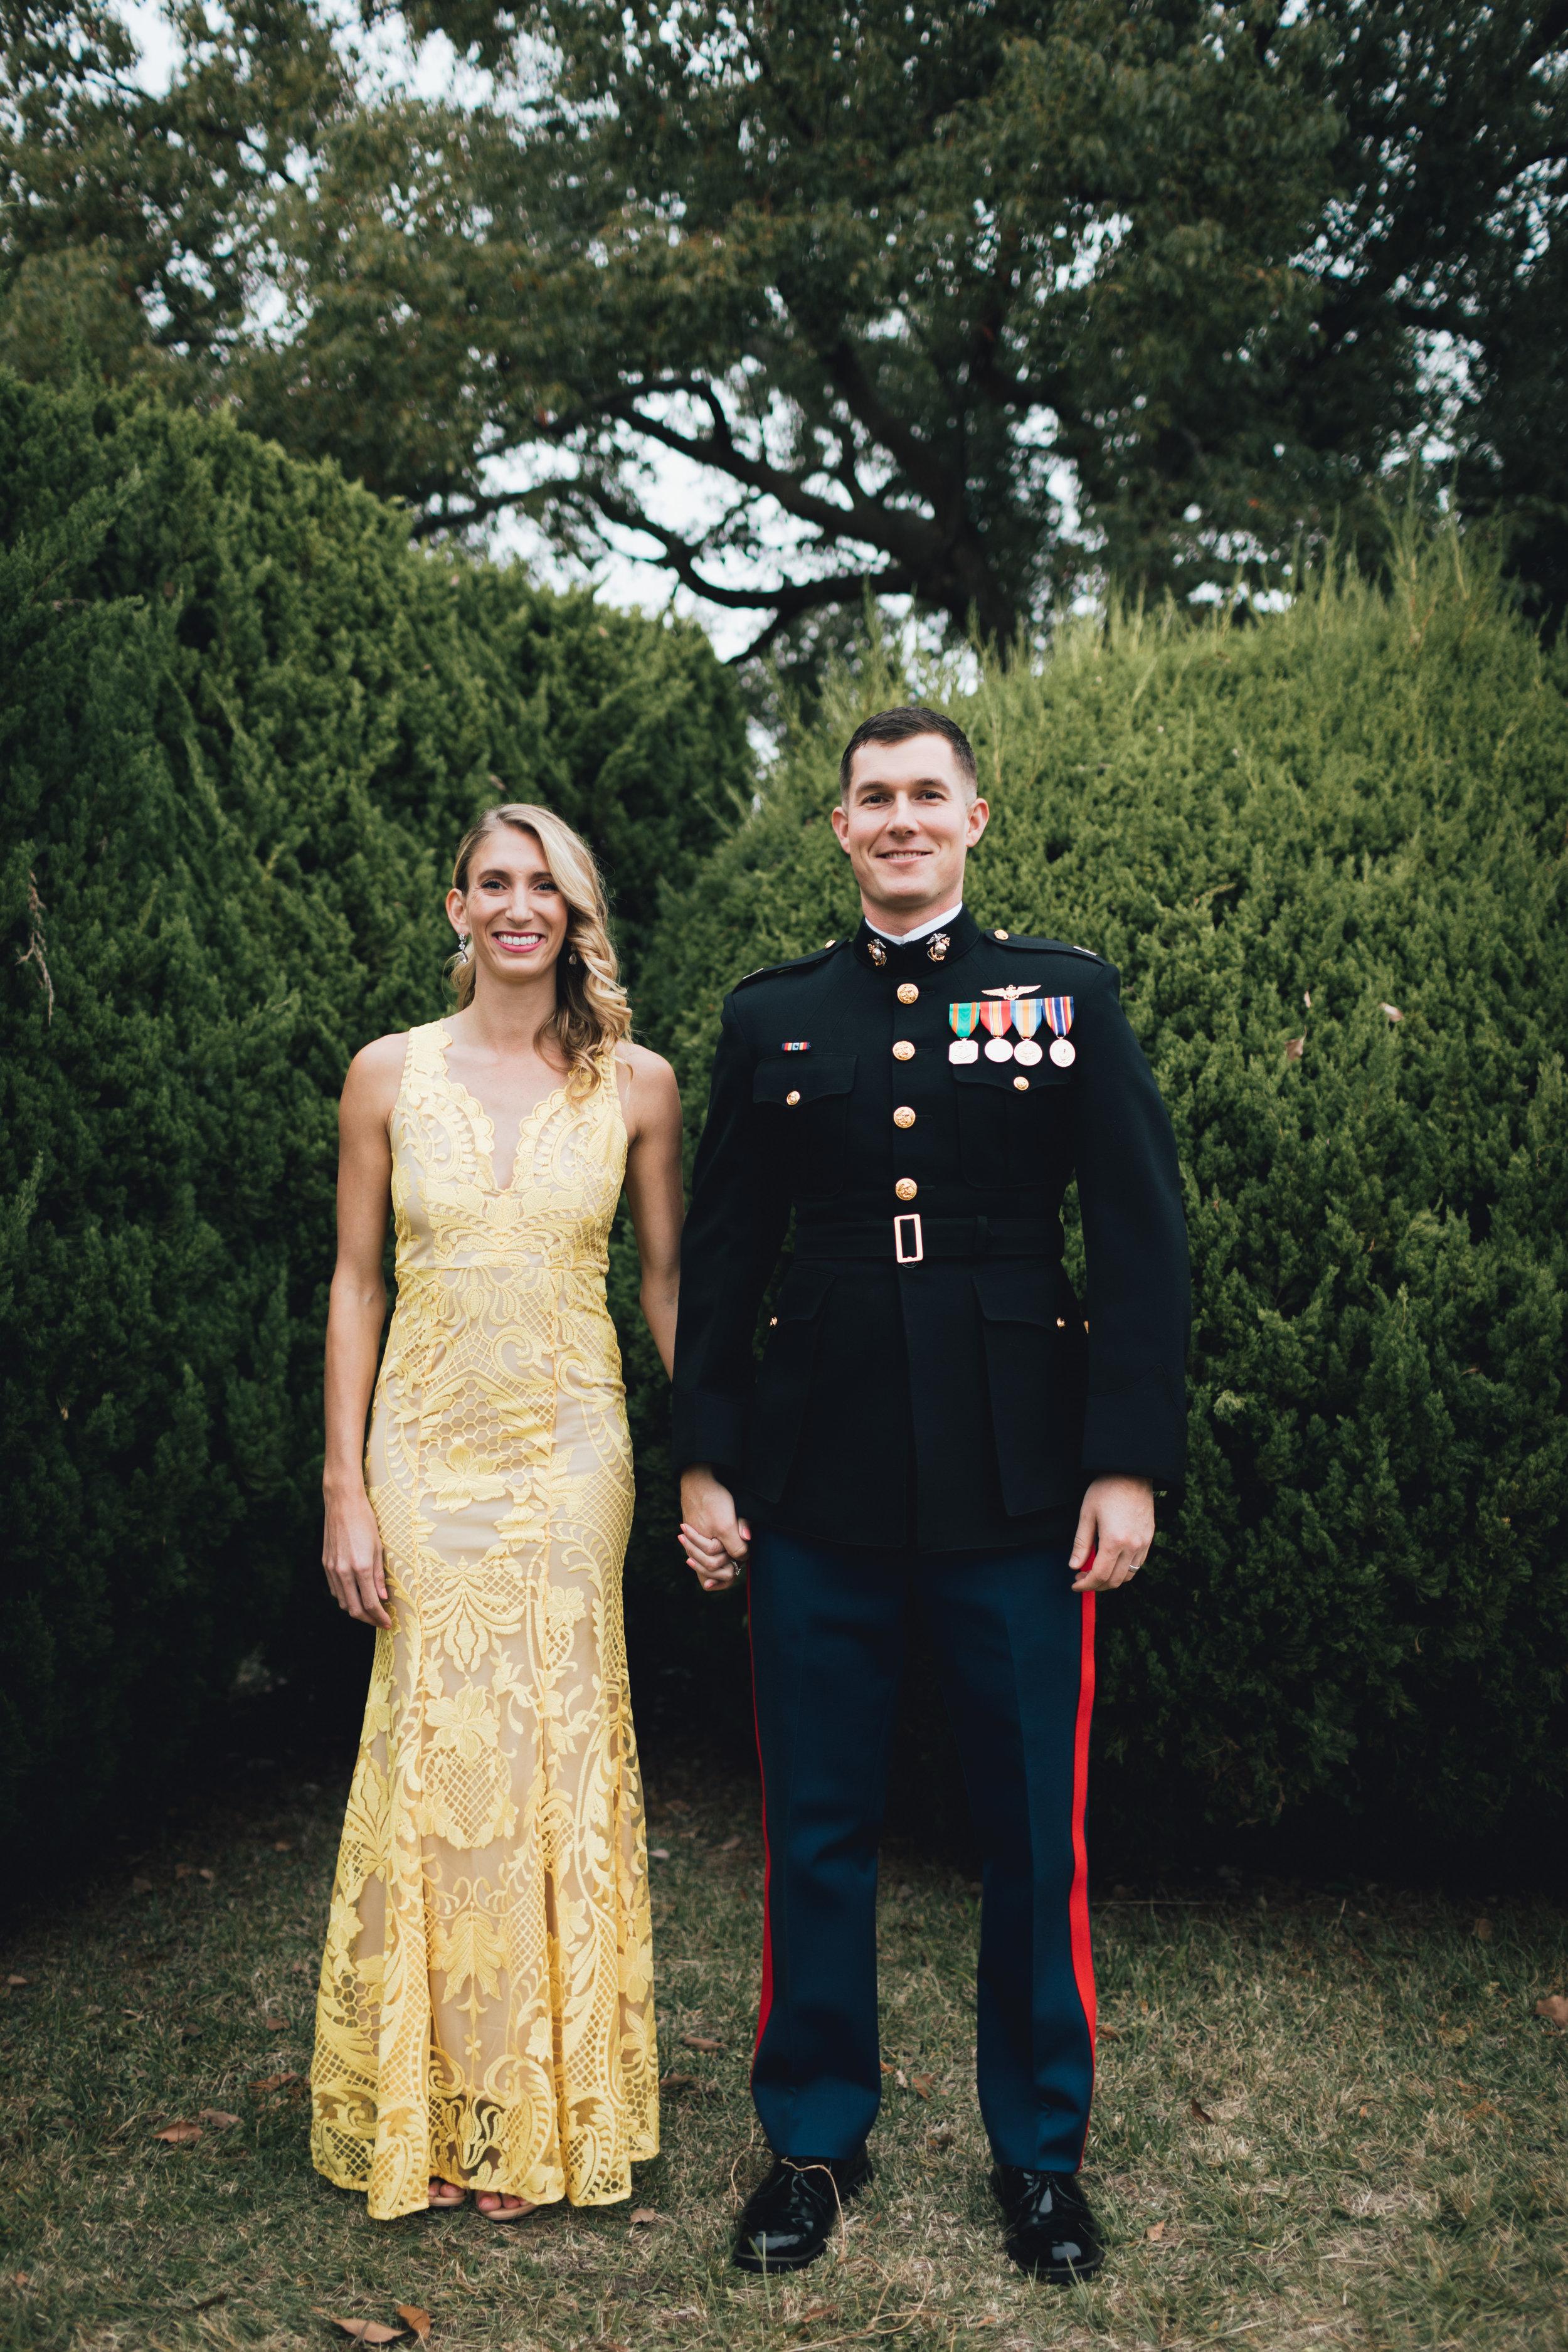 marine-corp-ball-couple-photos-by-samantha-look.jpg